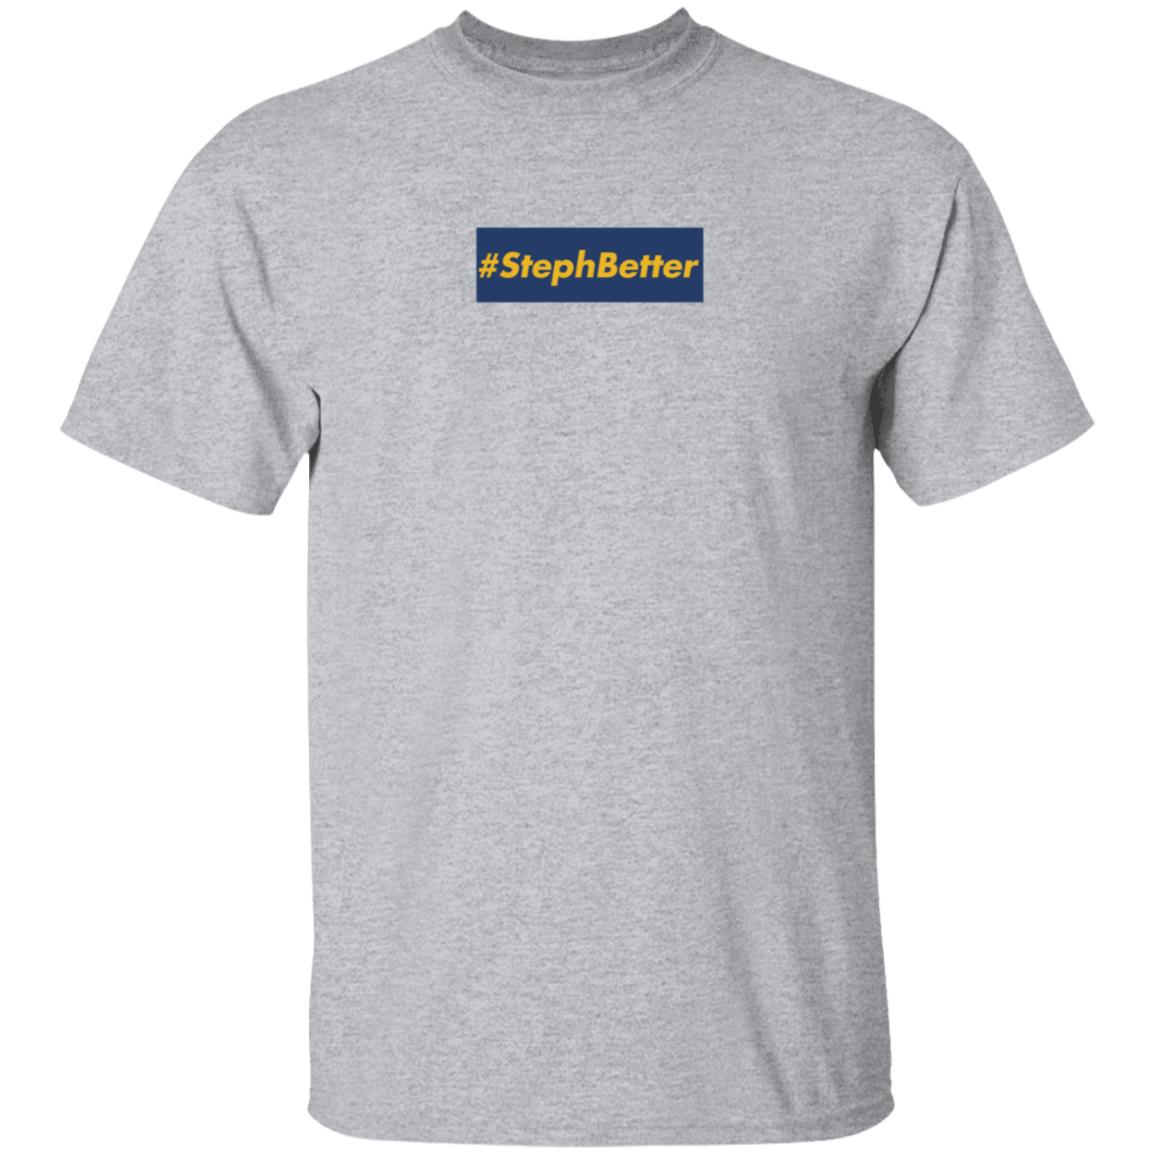 #Stephbetter Shirt keith dobkowski